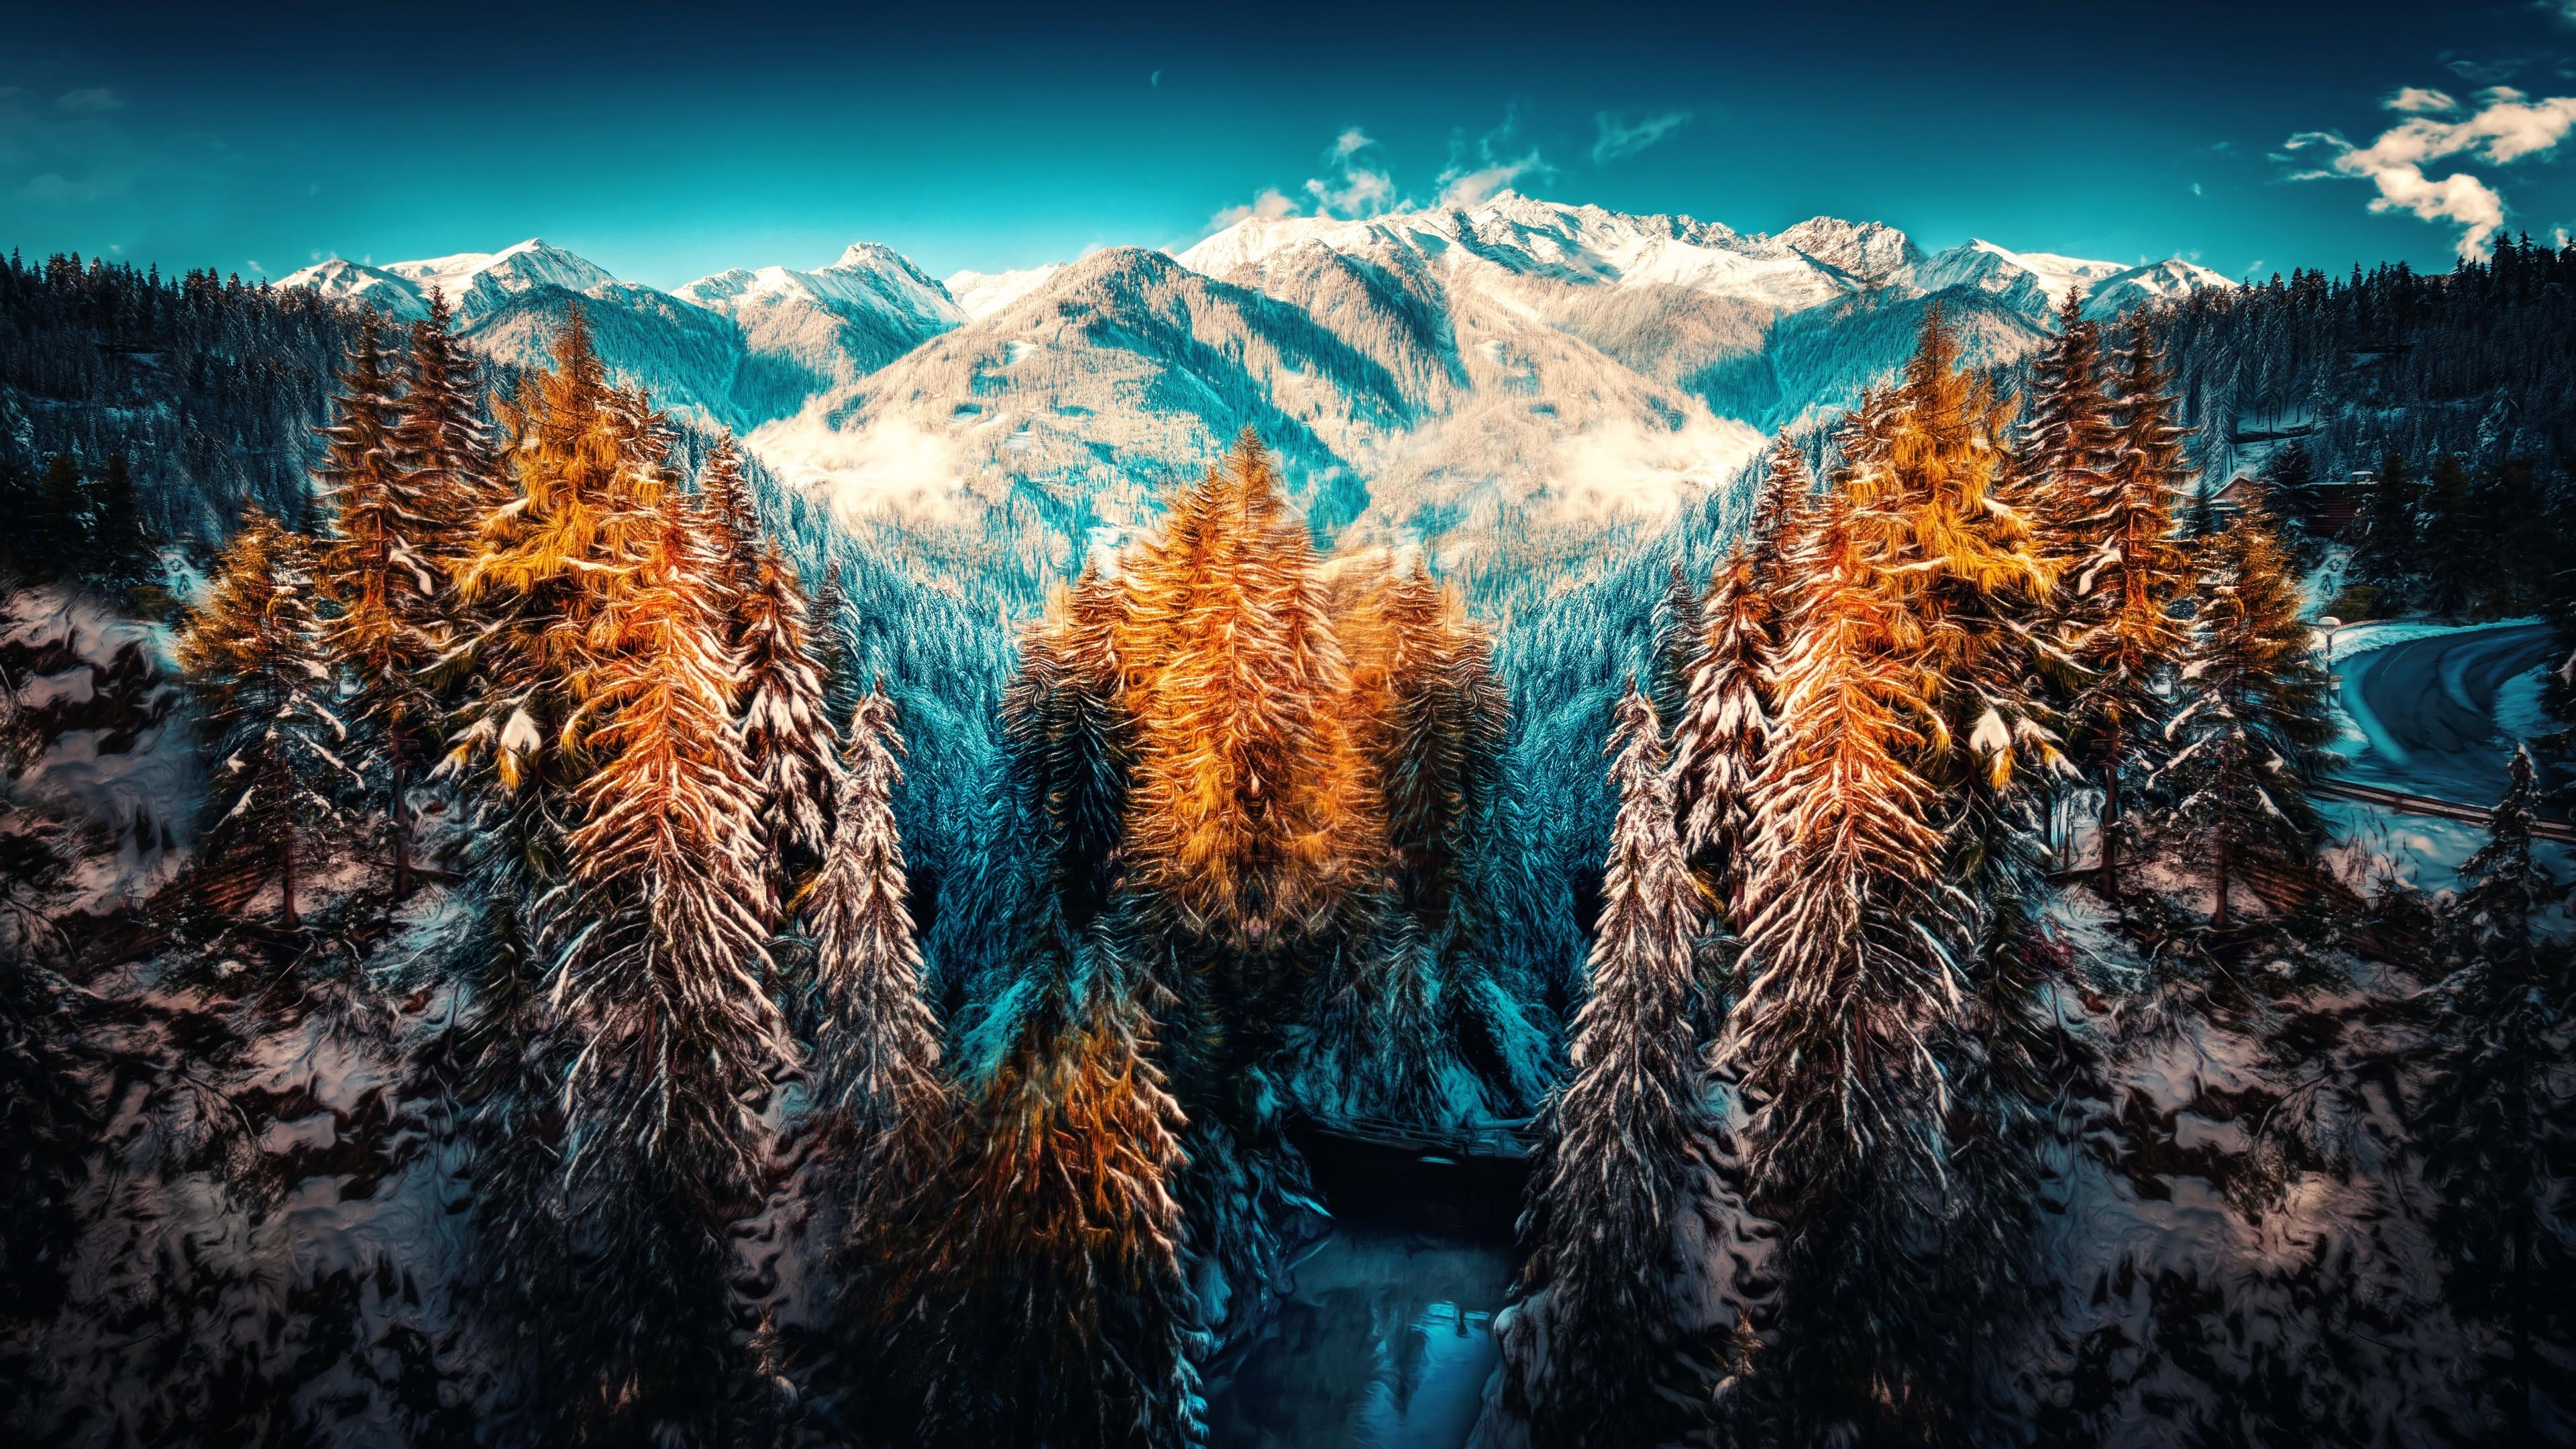 snow landscape mountains trees forest 4k 1540141100 - Snow Landscape Mountains Trees Forest 4k - trees wallpapers, snow wallpapers, nature wallpapers, mountains wallpapers, landscape wallpapers, hd-wallpapers, forest wallpapers, 5k wallpapers, 4k-wallpapers